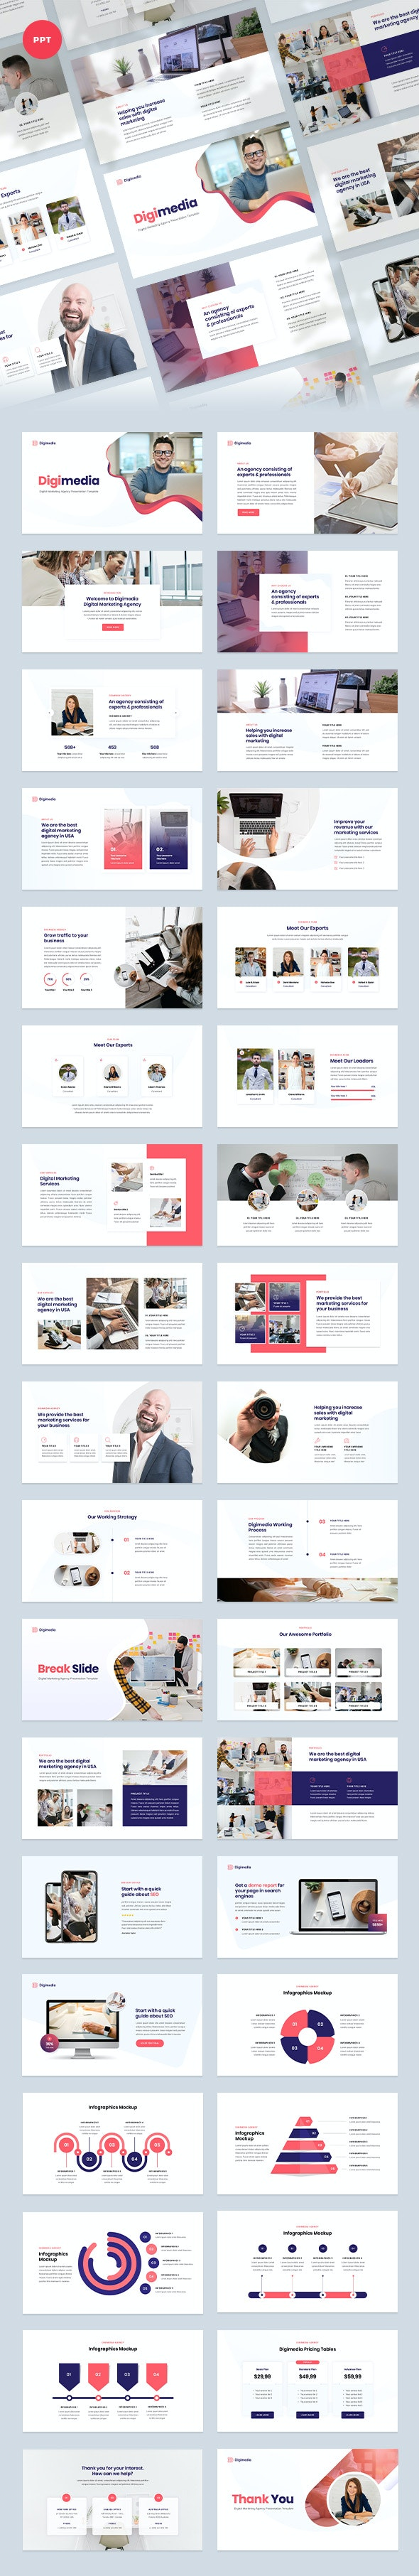 Digital Marketing Agency PowerPoint Template